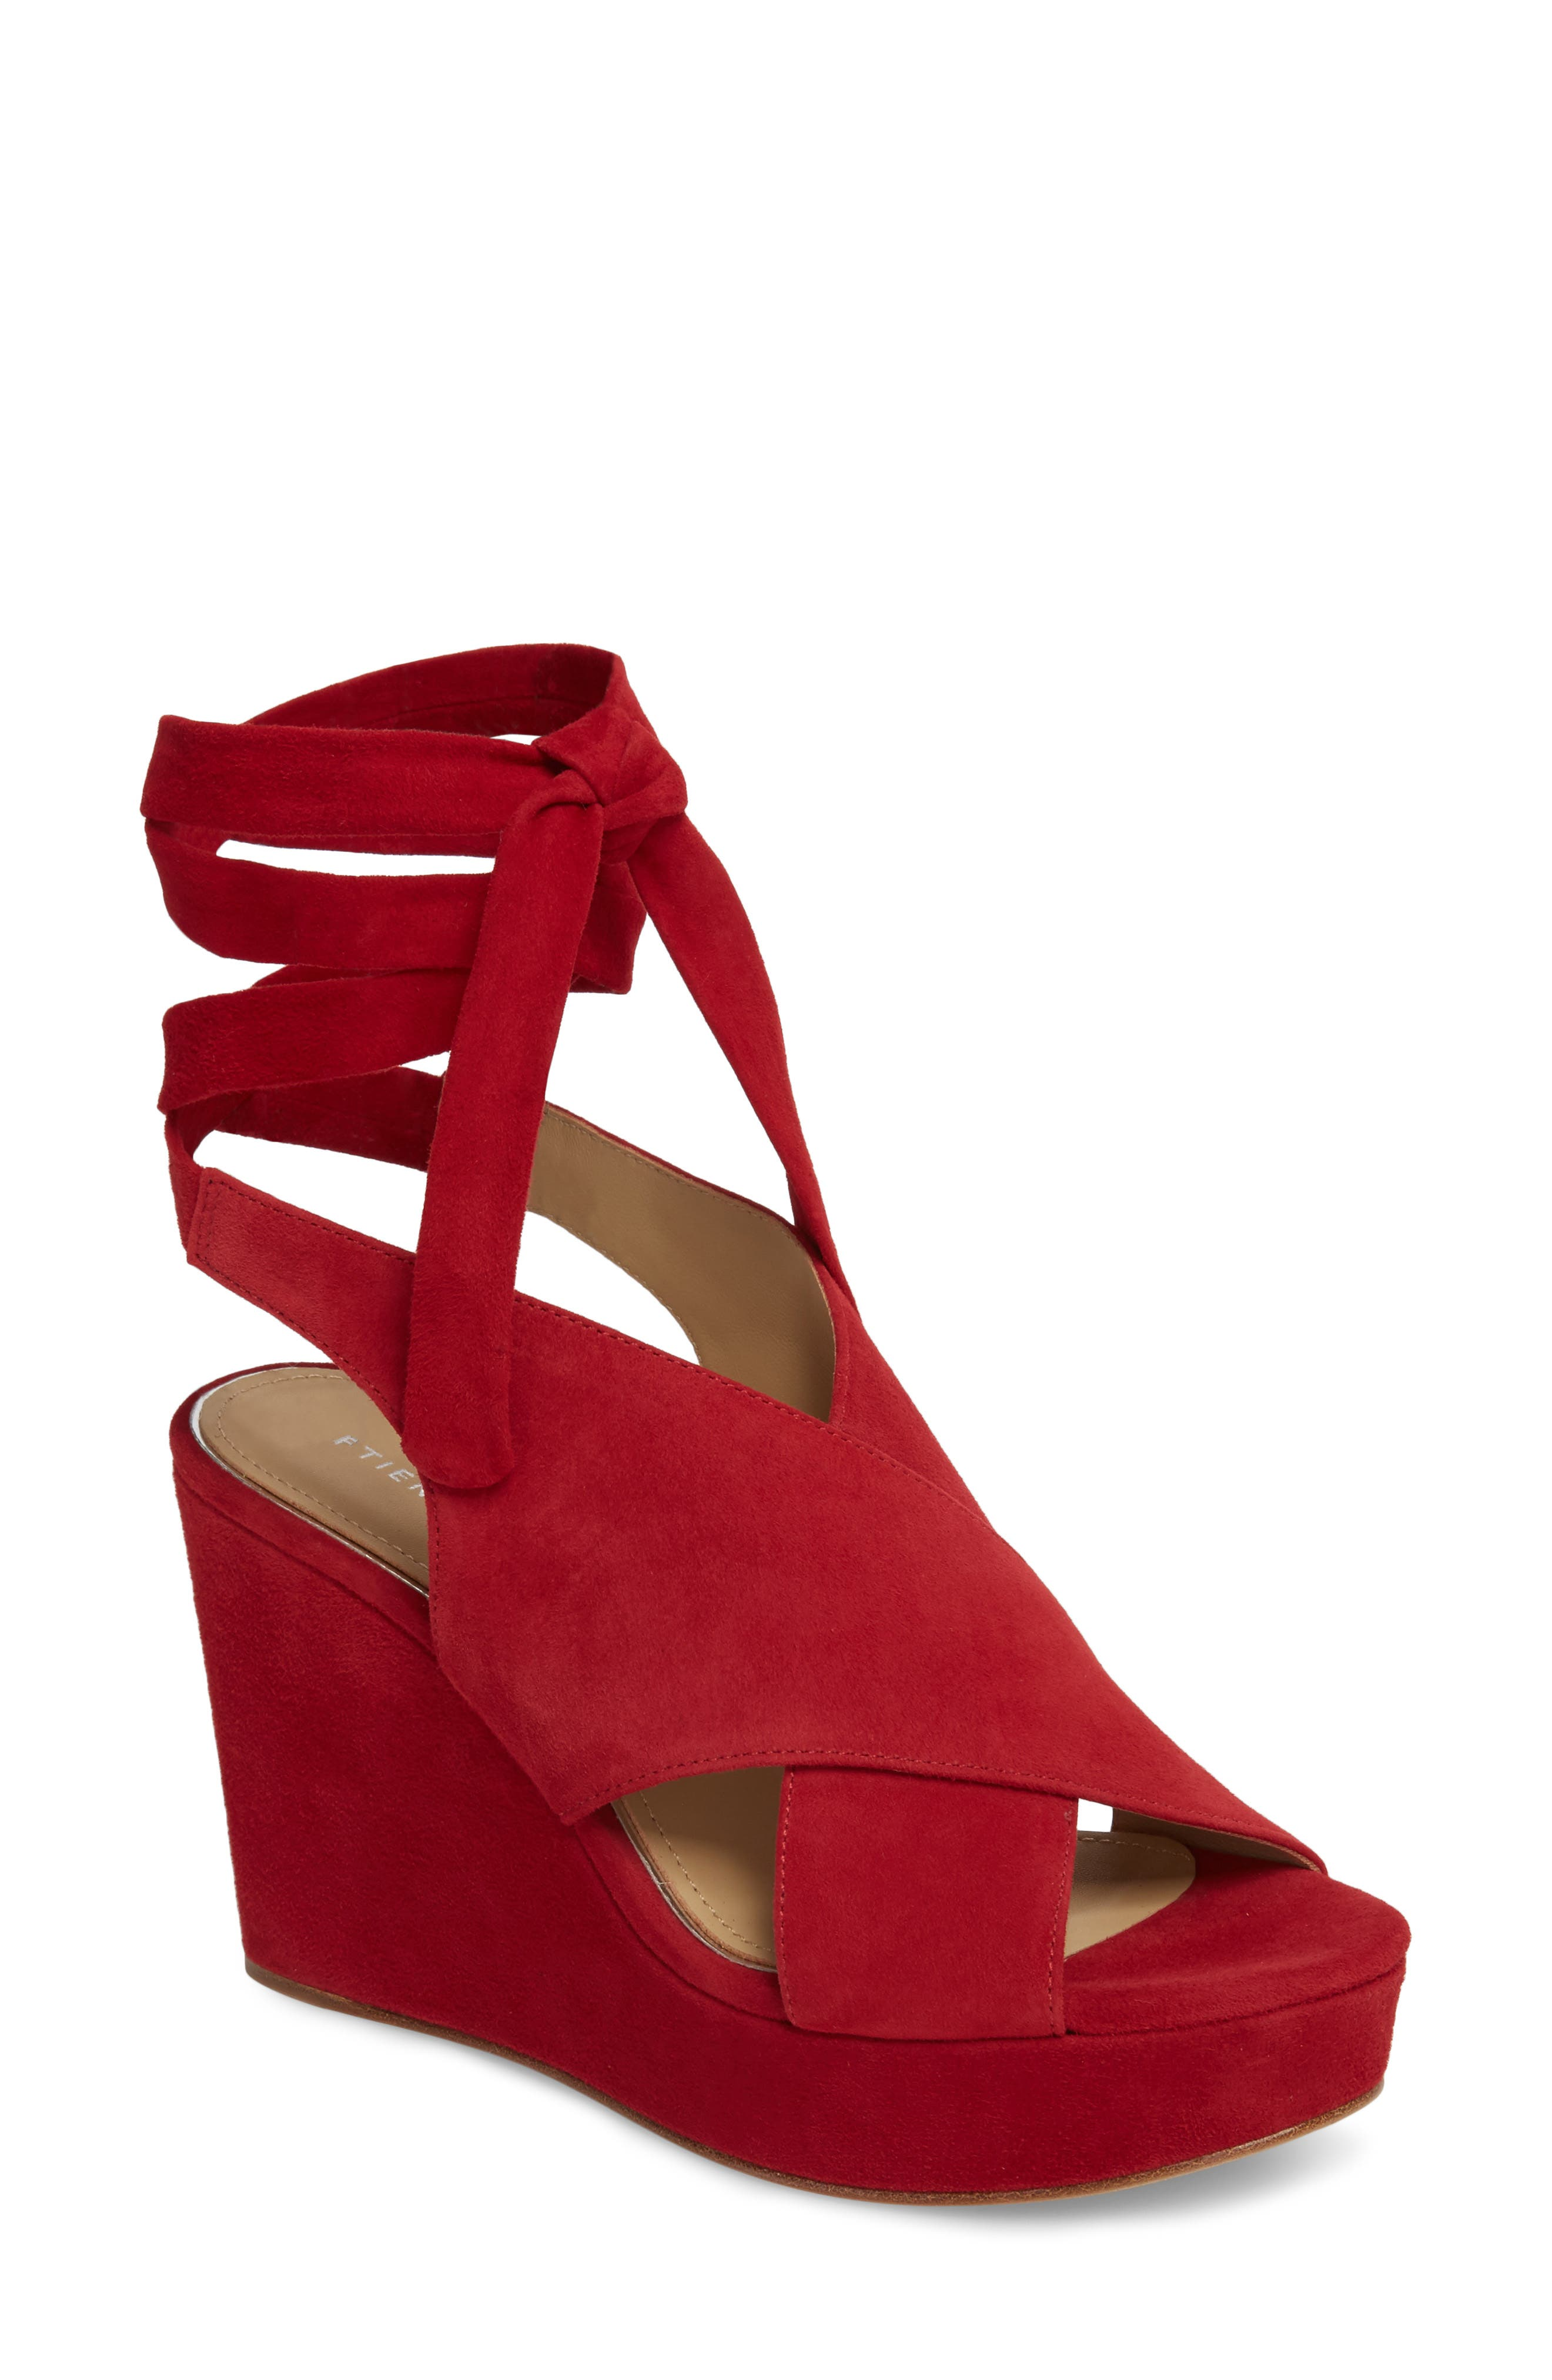 Image of Etienne Aigner Dominica Suede Platform Wedge Sandal